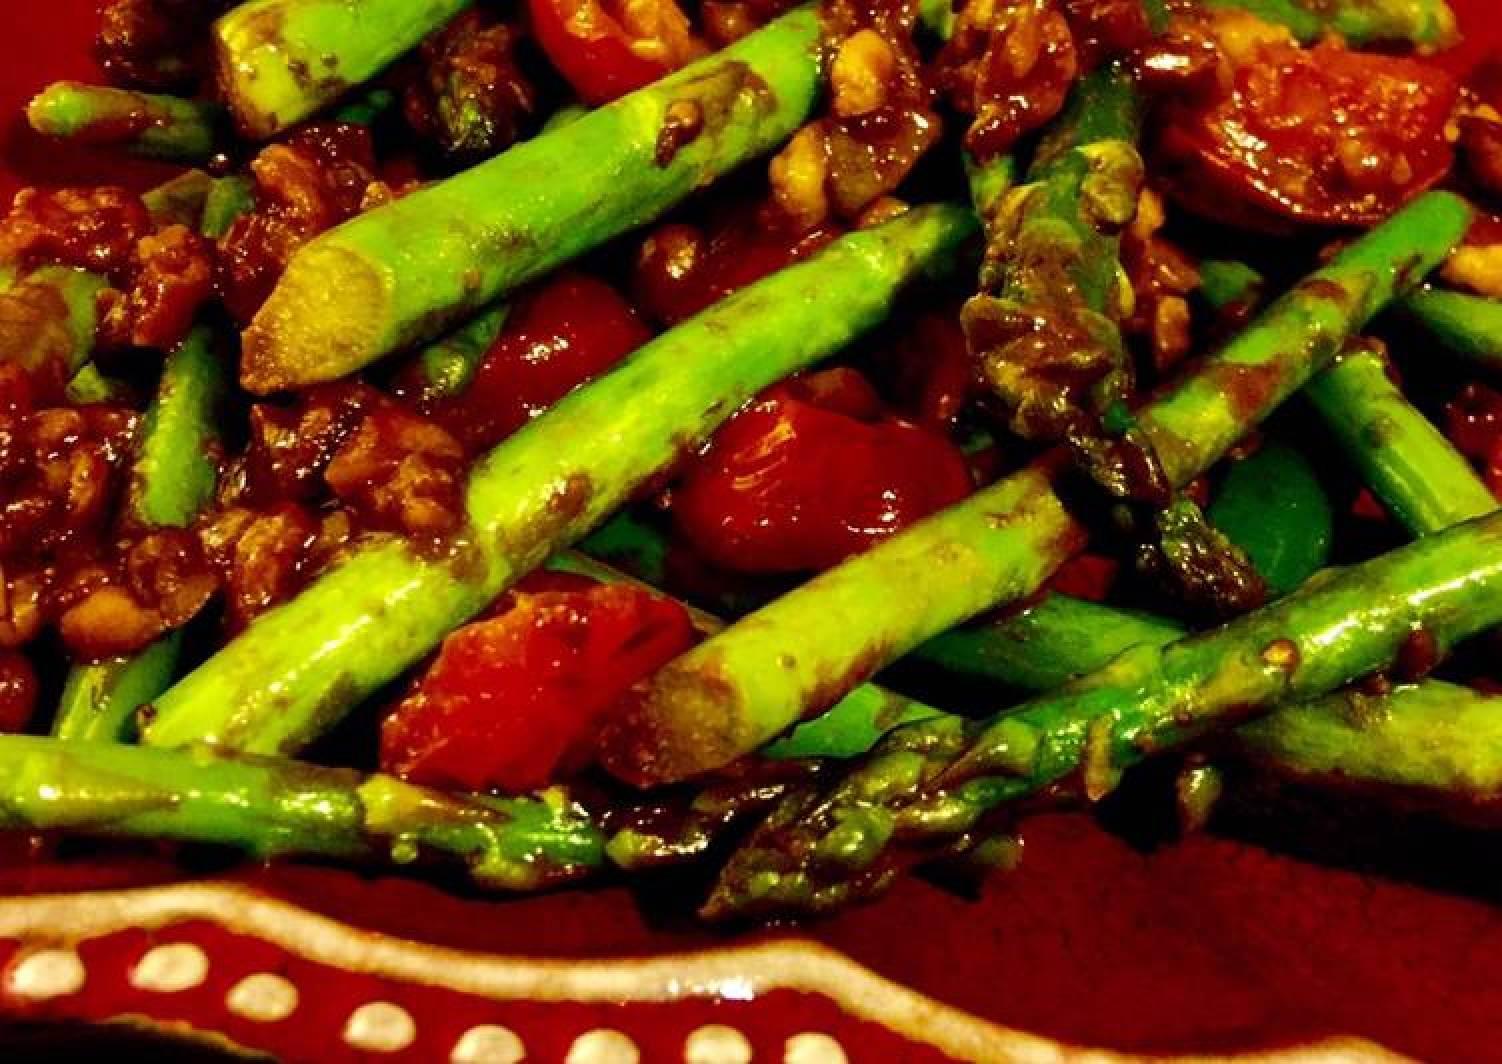 Asparagus in Spicy Peanut Dressing